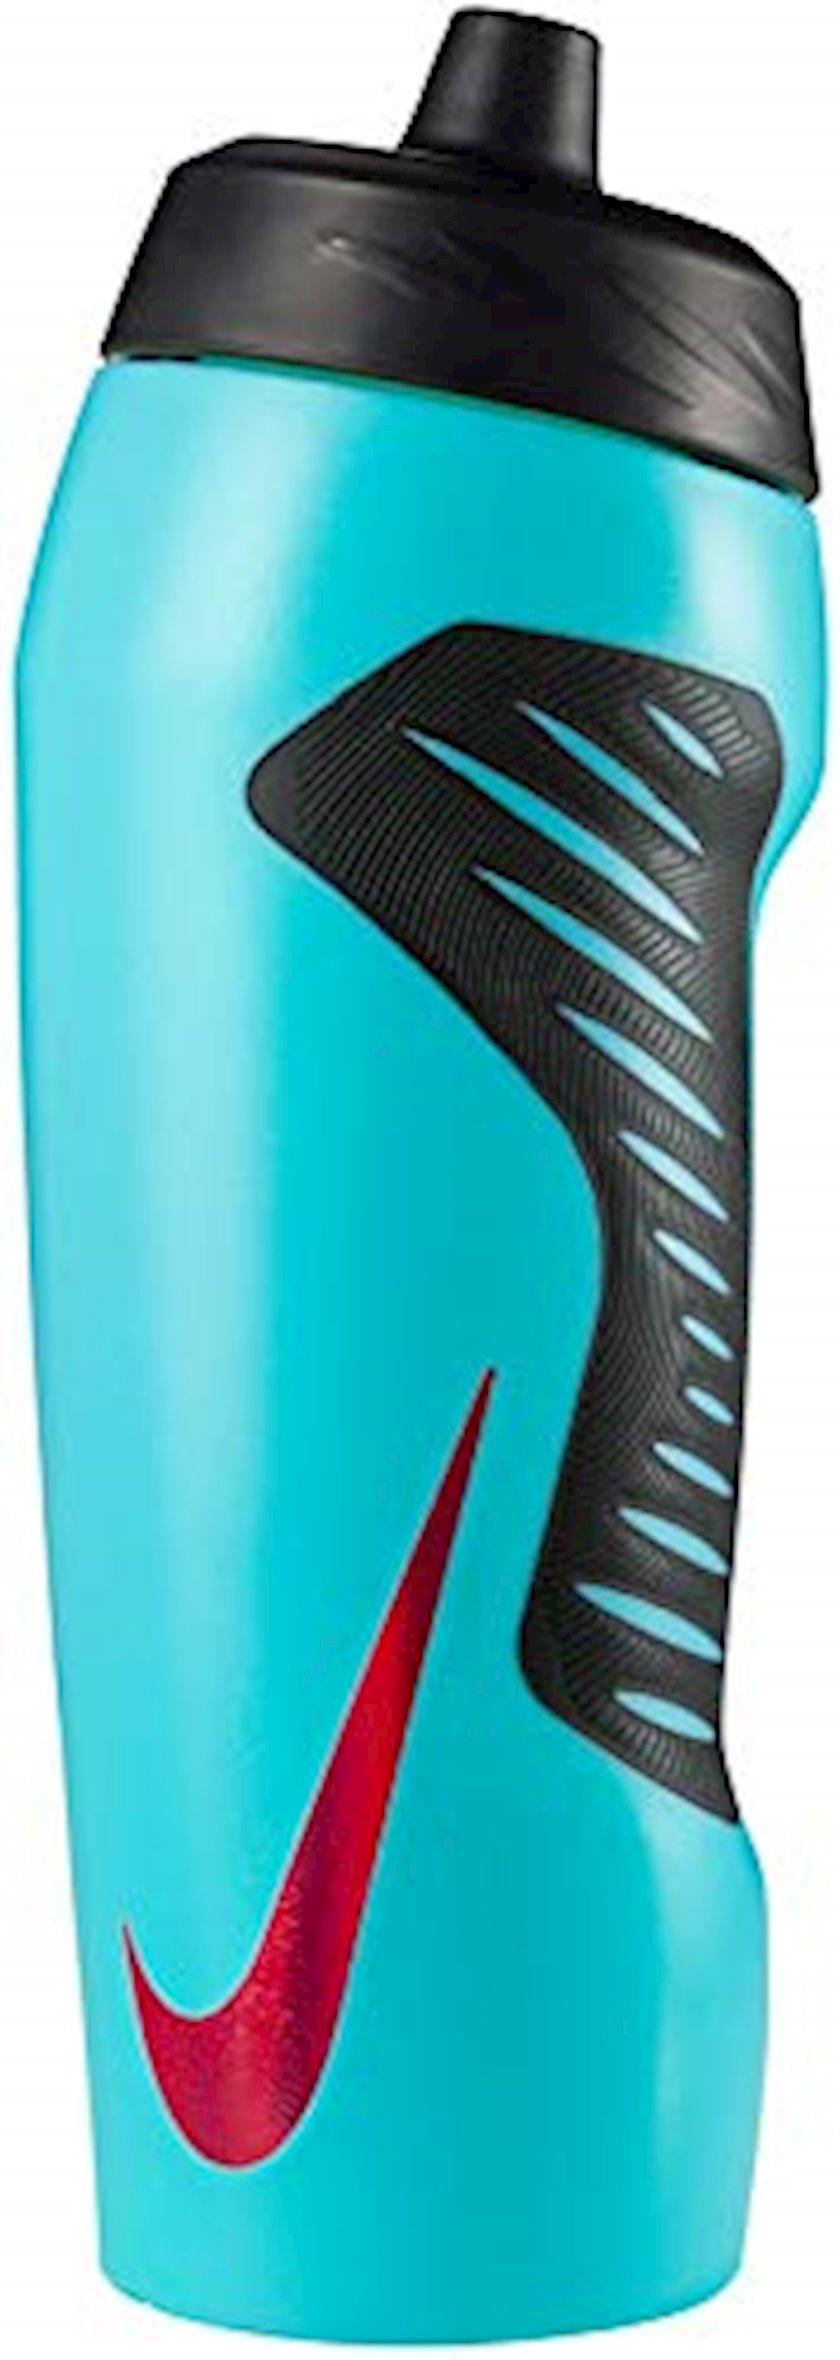 Butulka Nike Hyperfuel Water Bottle, 532 ml, Mavi